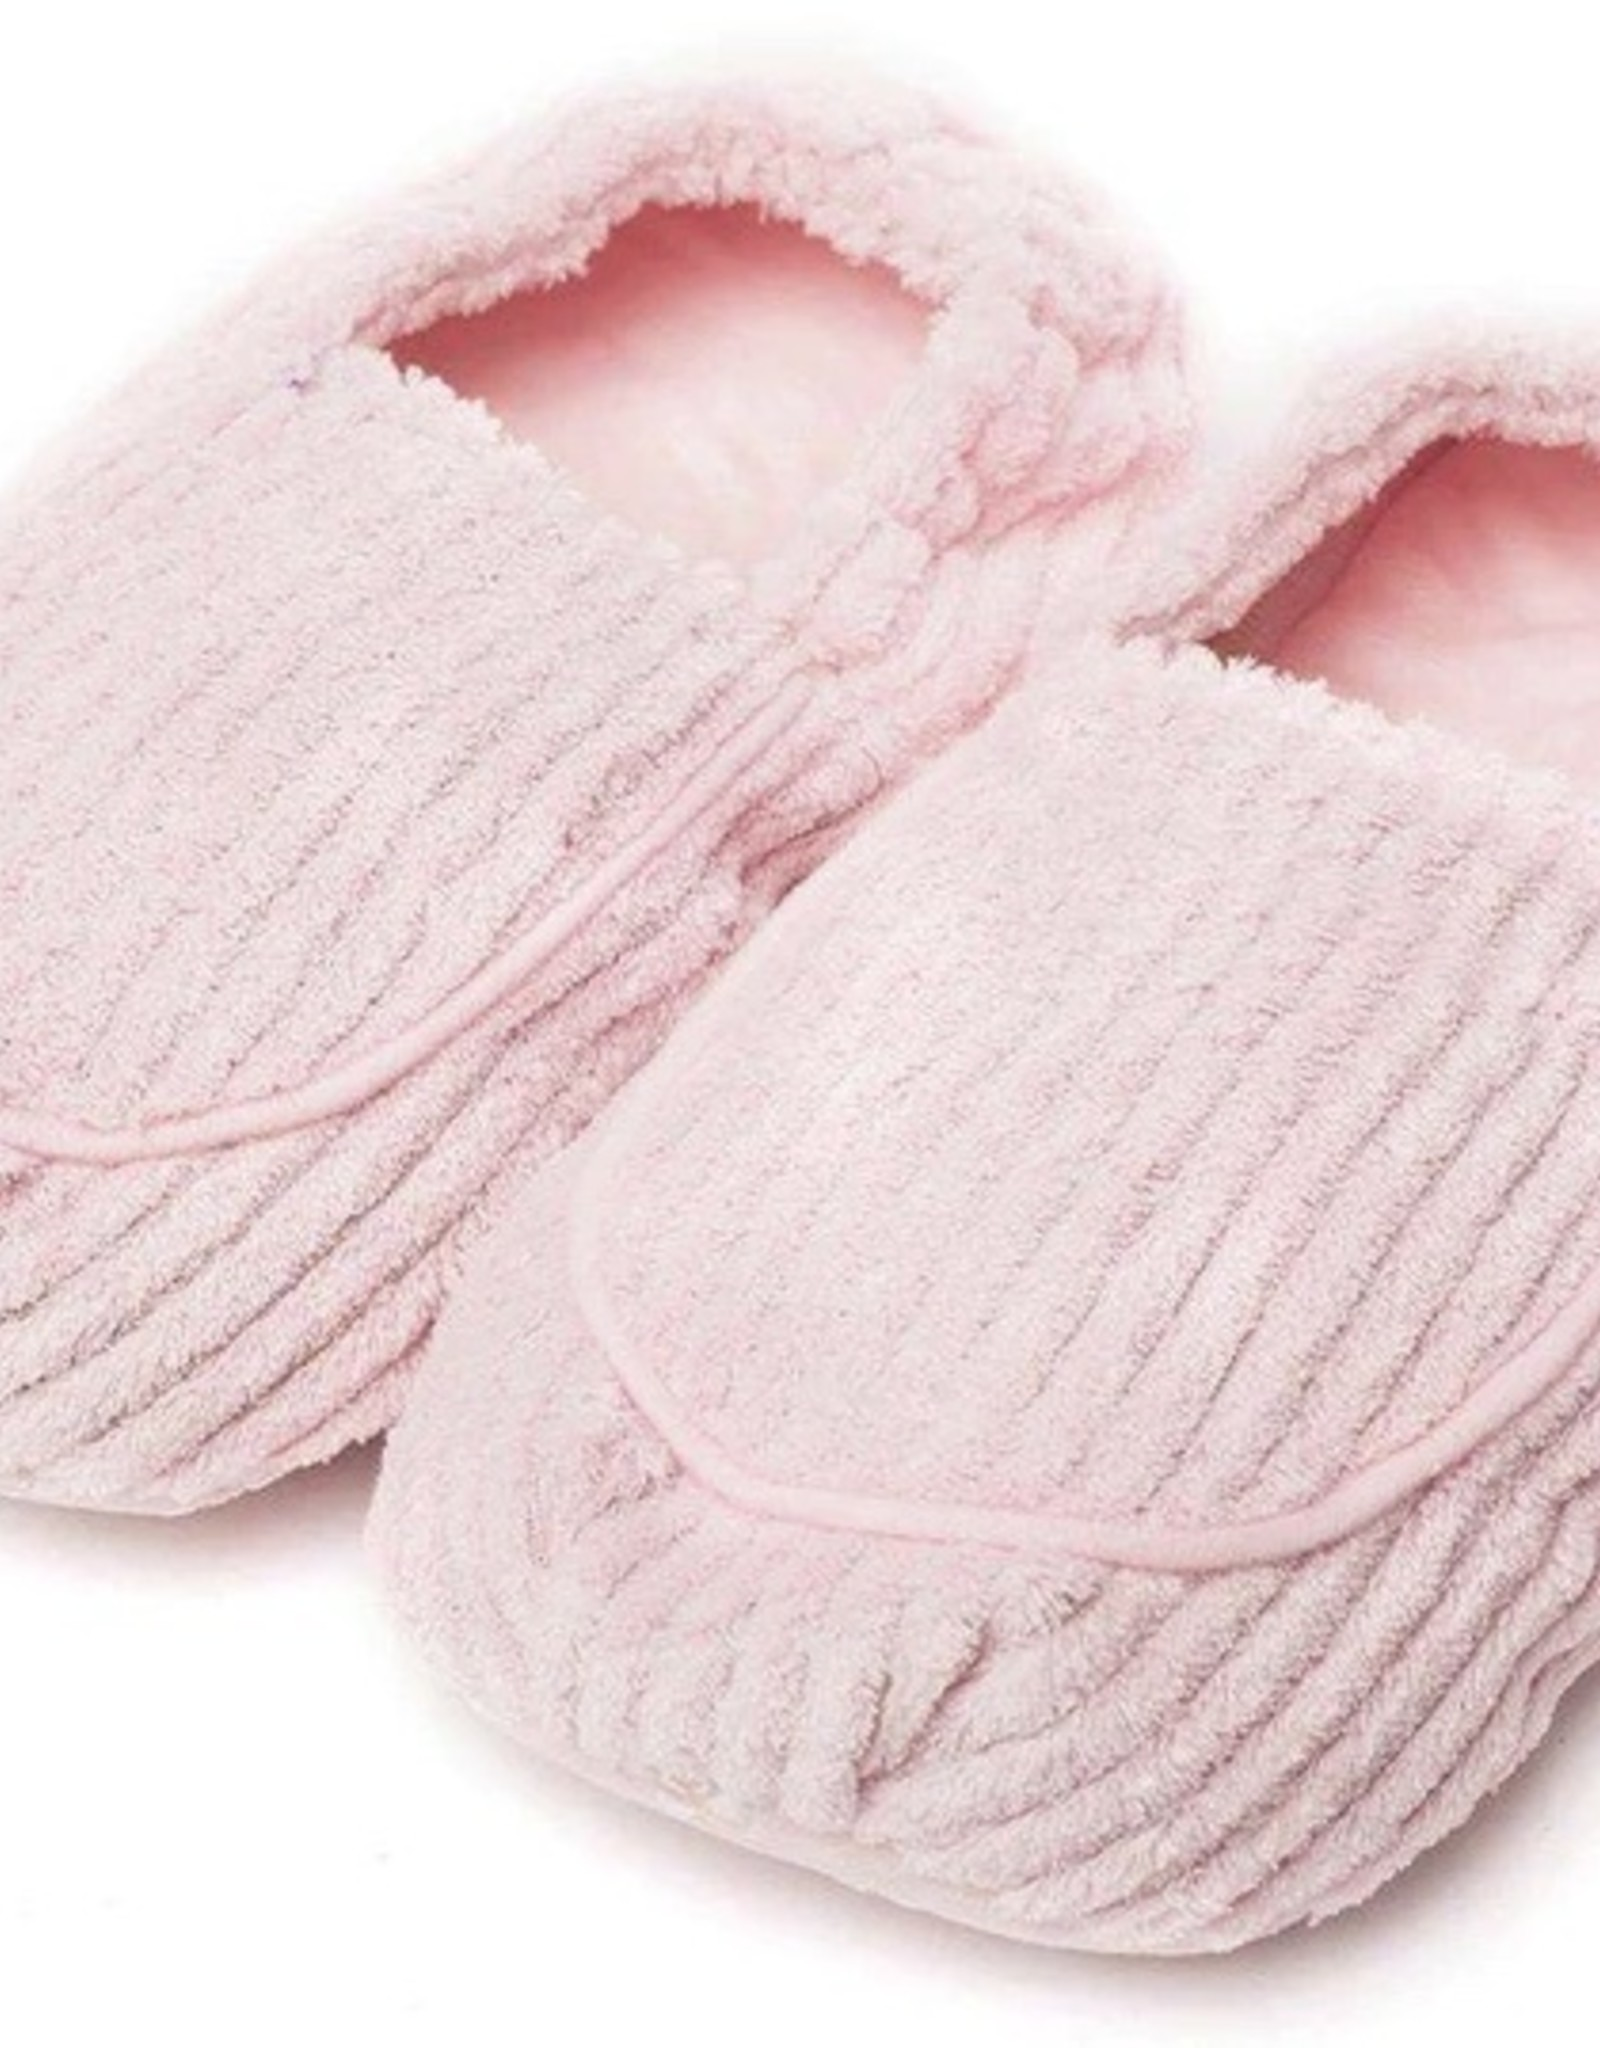 INTELEX Pink Warmies Slippers